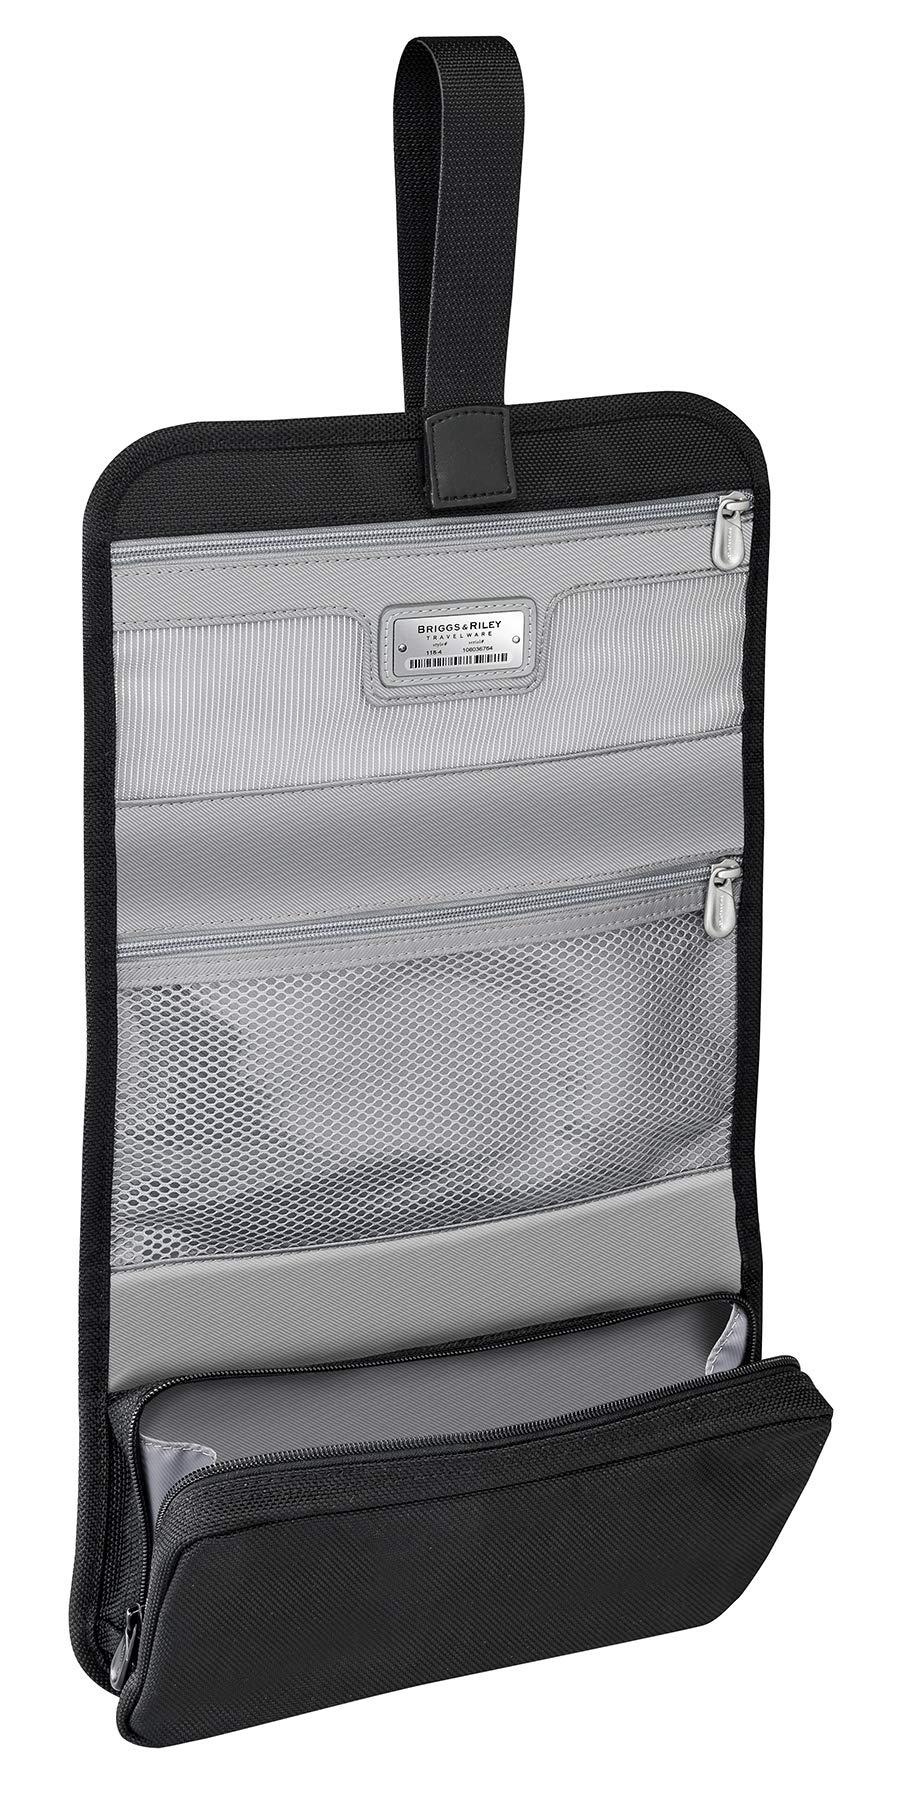 Briggs & Riley Baseline Compact Toiletry Kit, Black, Medium by Briggs & Riley (Image #2)